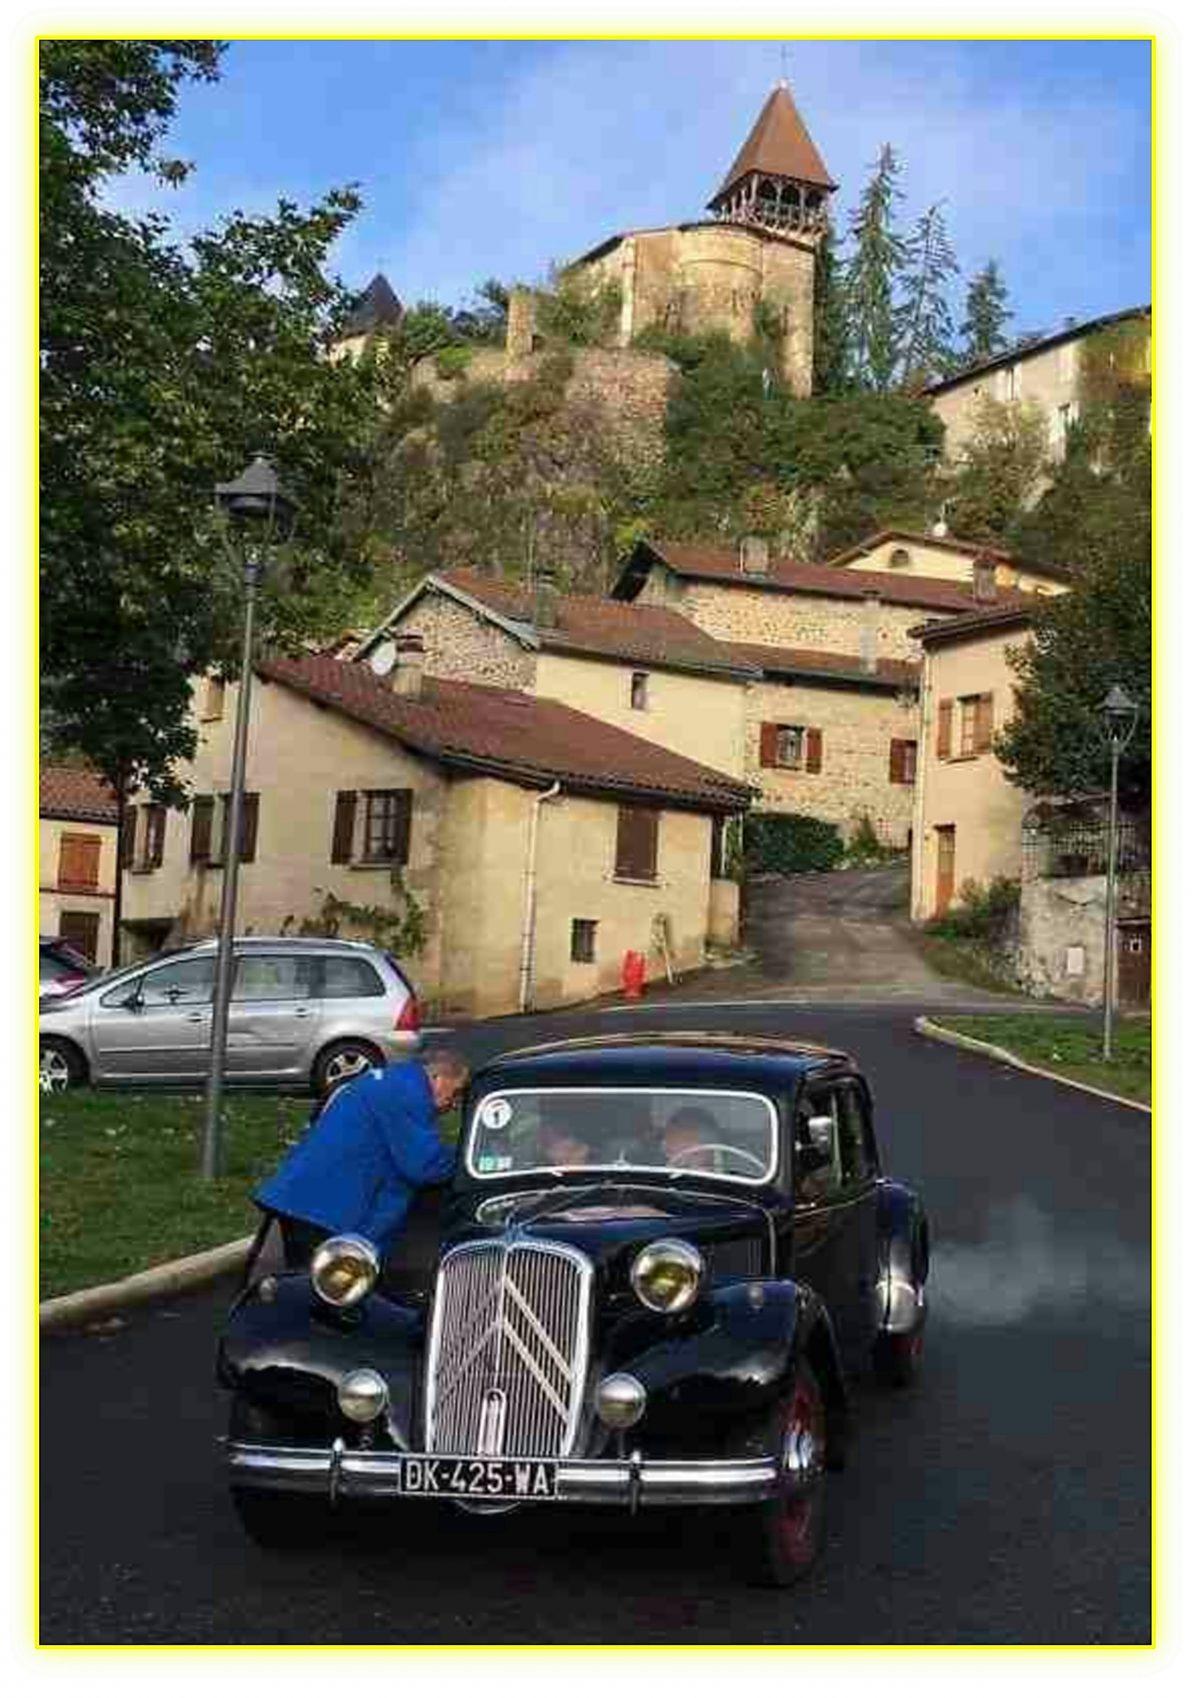 Rallye d'Automne, 15 octobre 2016